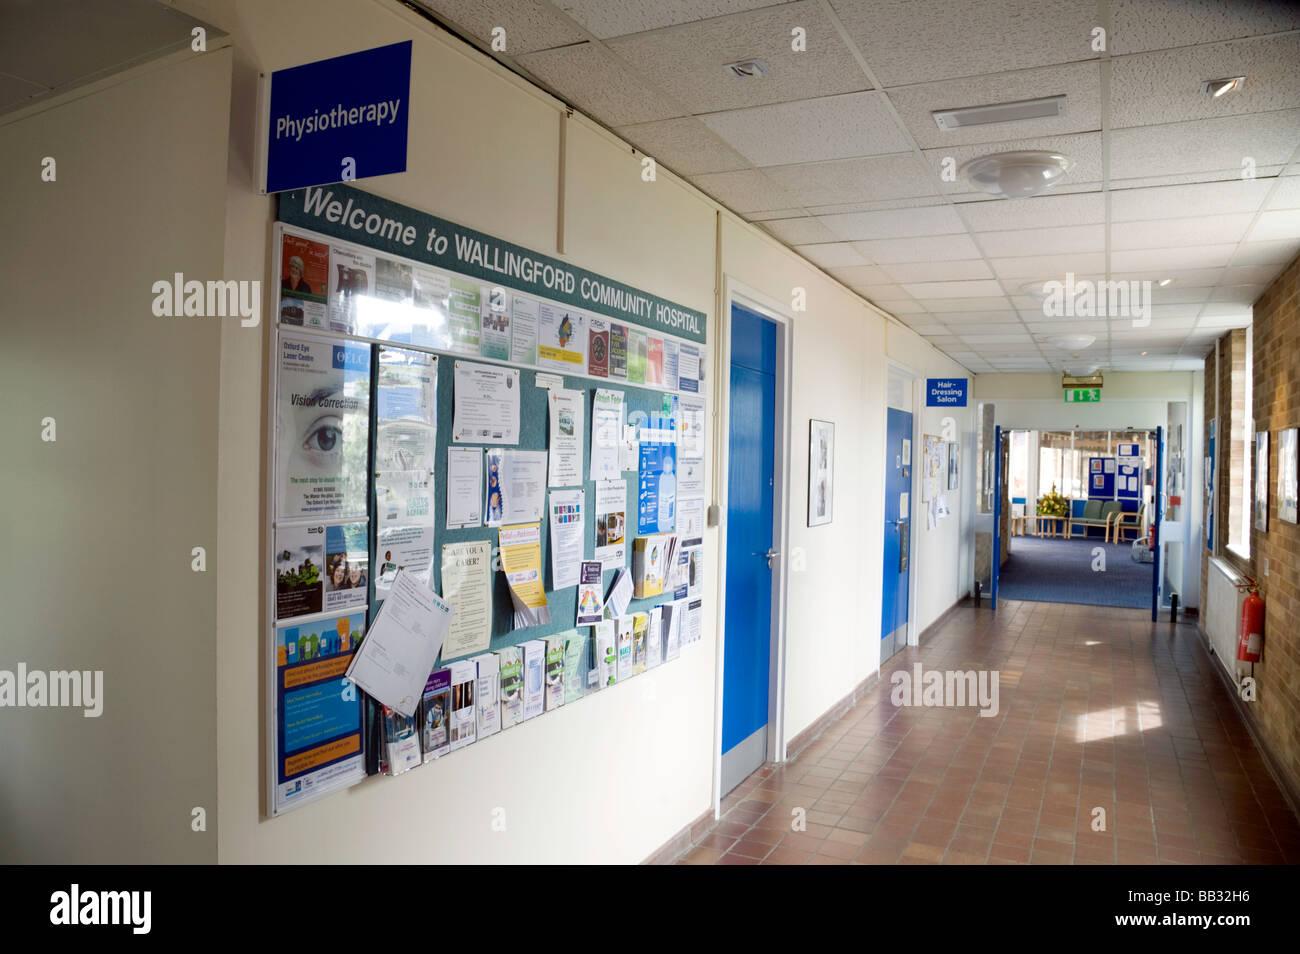 An empty corridor, Wallingford Community Hospital, Wallingford, Oxfordshire, England - Stock Image